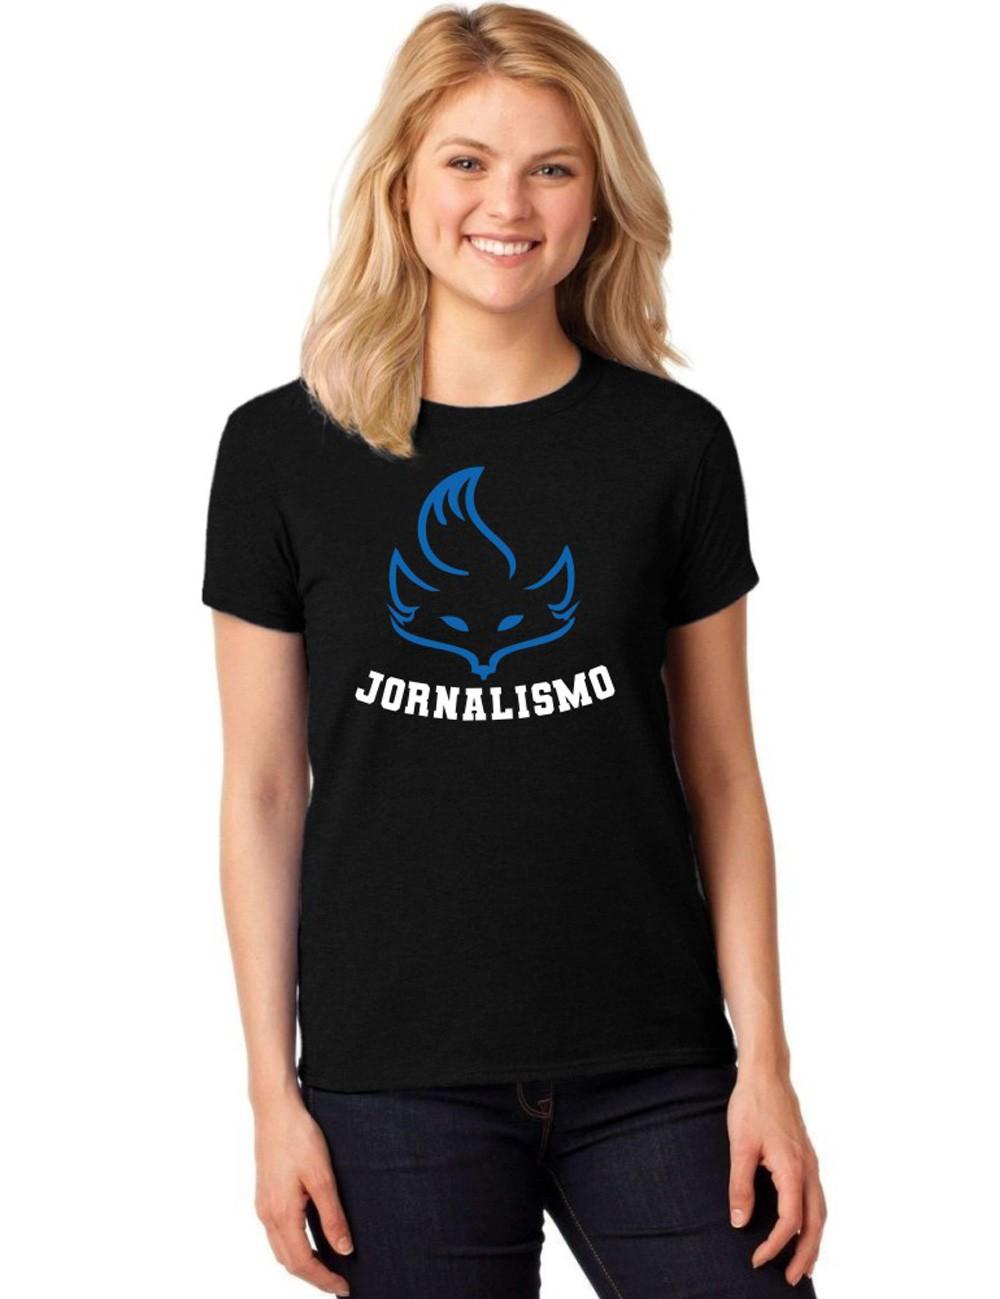 Camiseta Feminina T-Shirt Universitária Faculdade Jornalismo